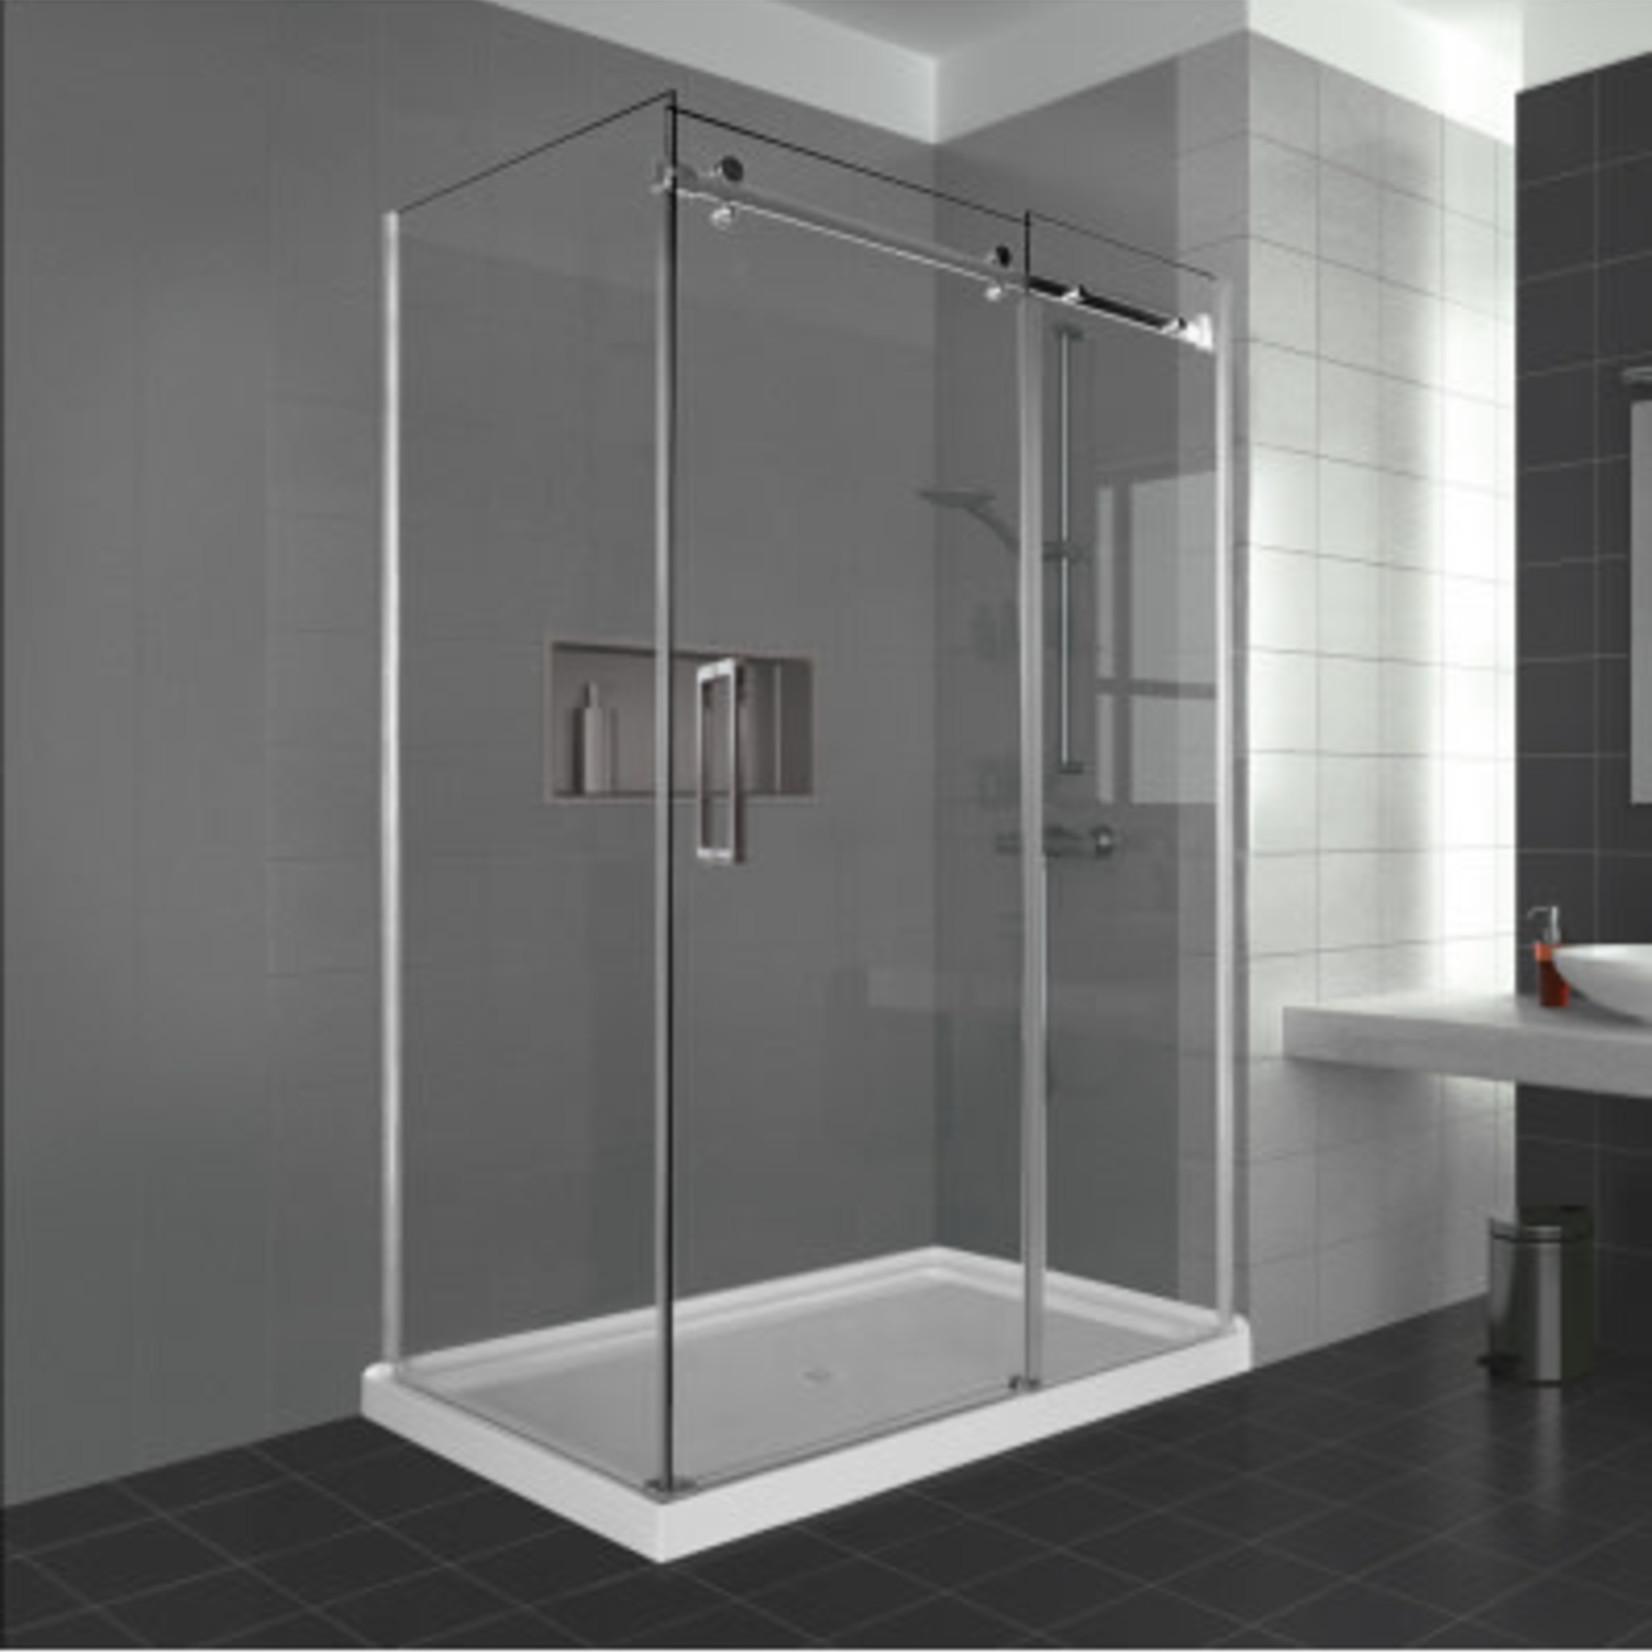 Reversible shower set 32x48 chrome Caruso Nautika series